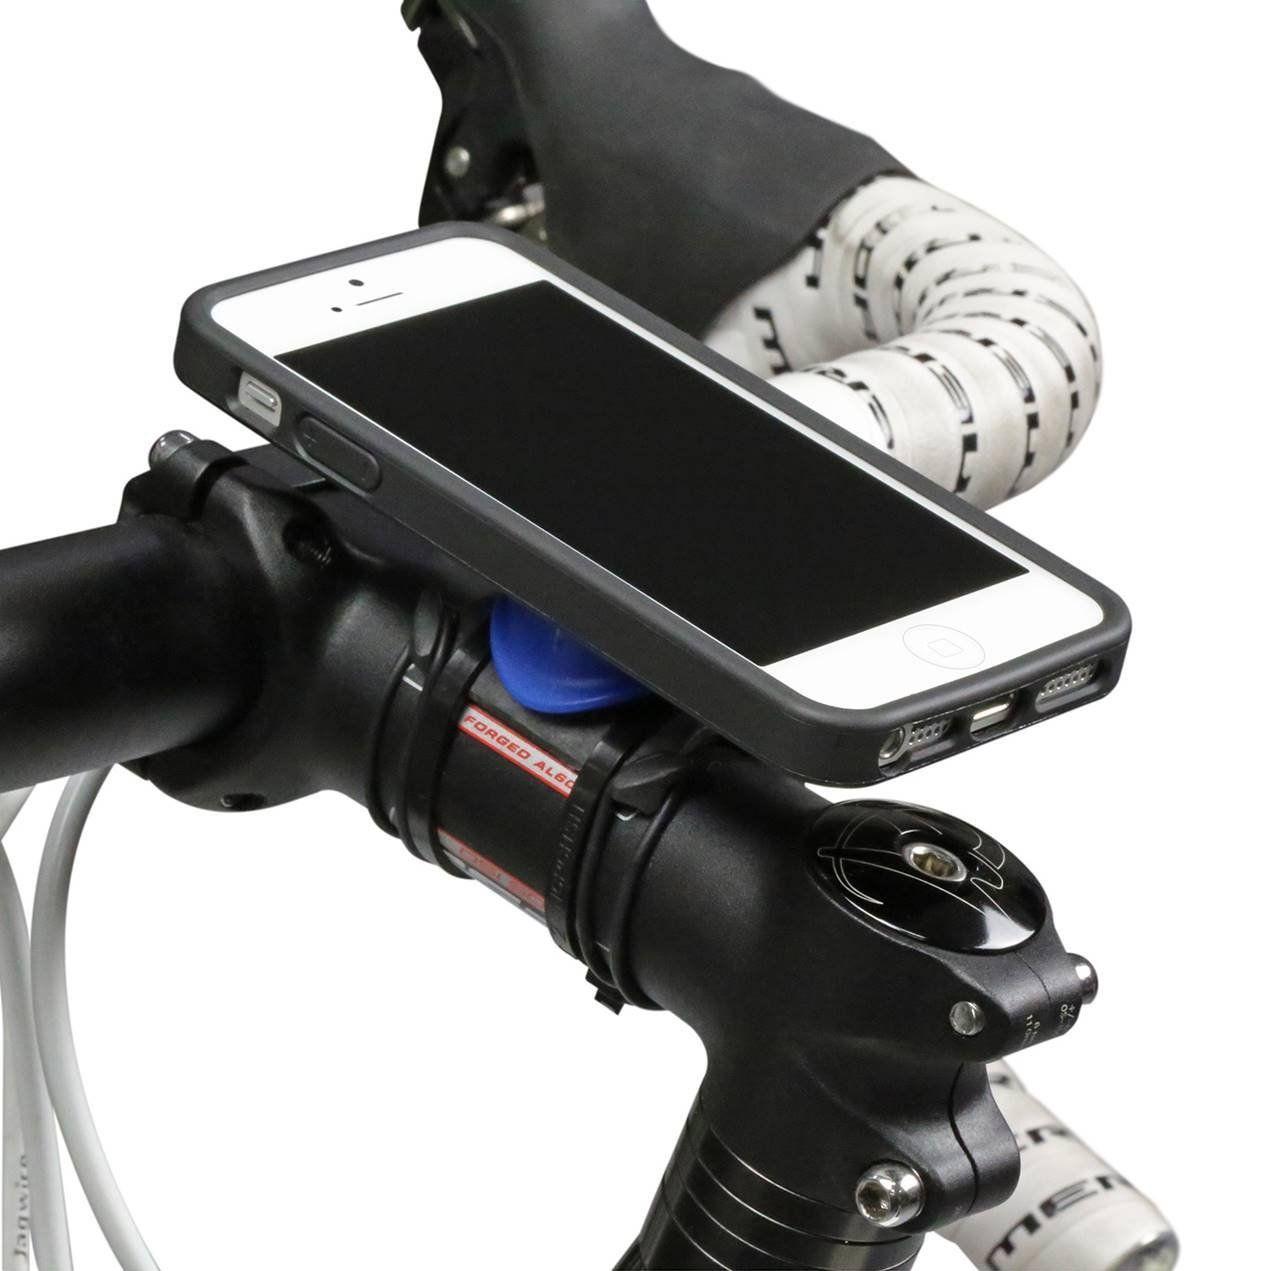 Annex Quad Lock Bike Mount Kit For Iphone 5 5s Black Bike Kit